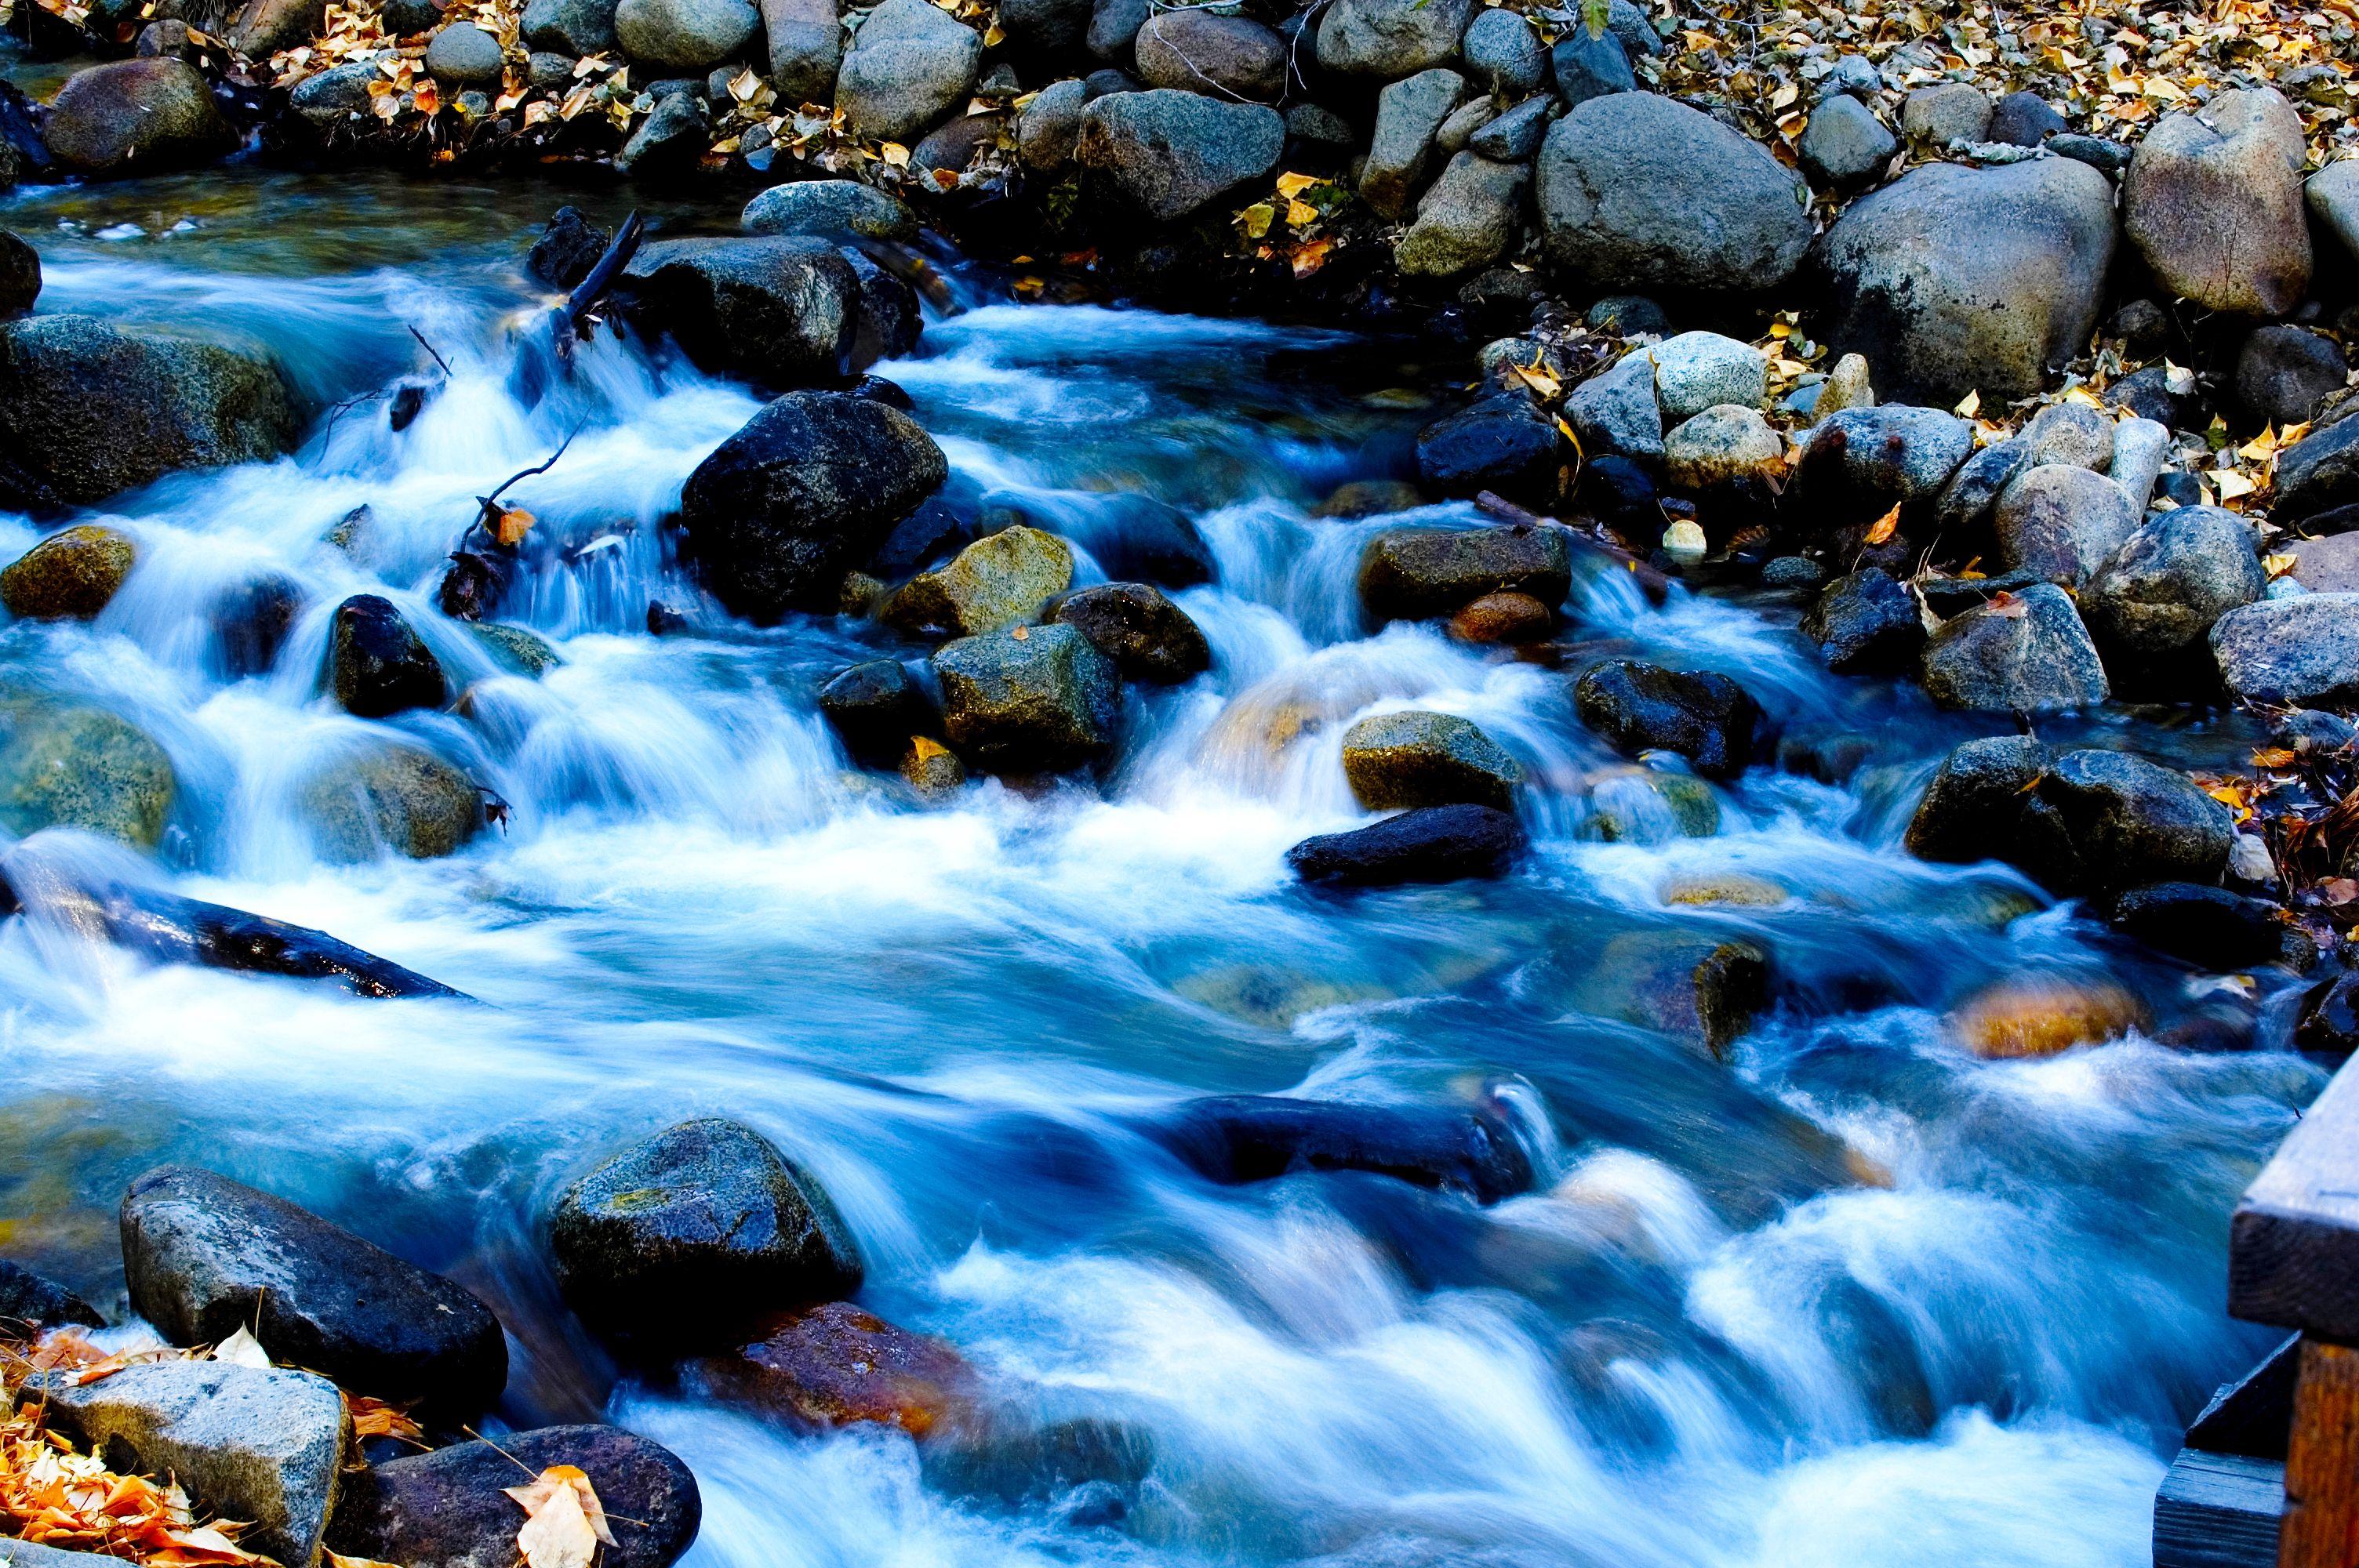 water flowing over rocks   Advanced Art Projects   Pinterest   Water ...